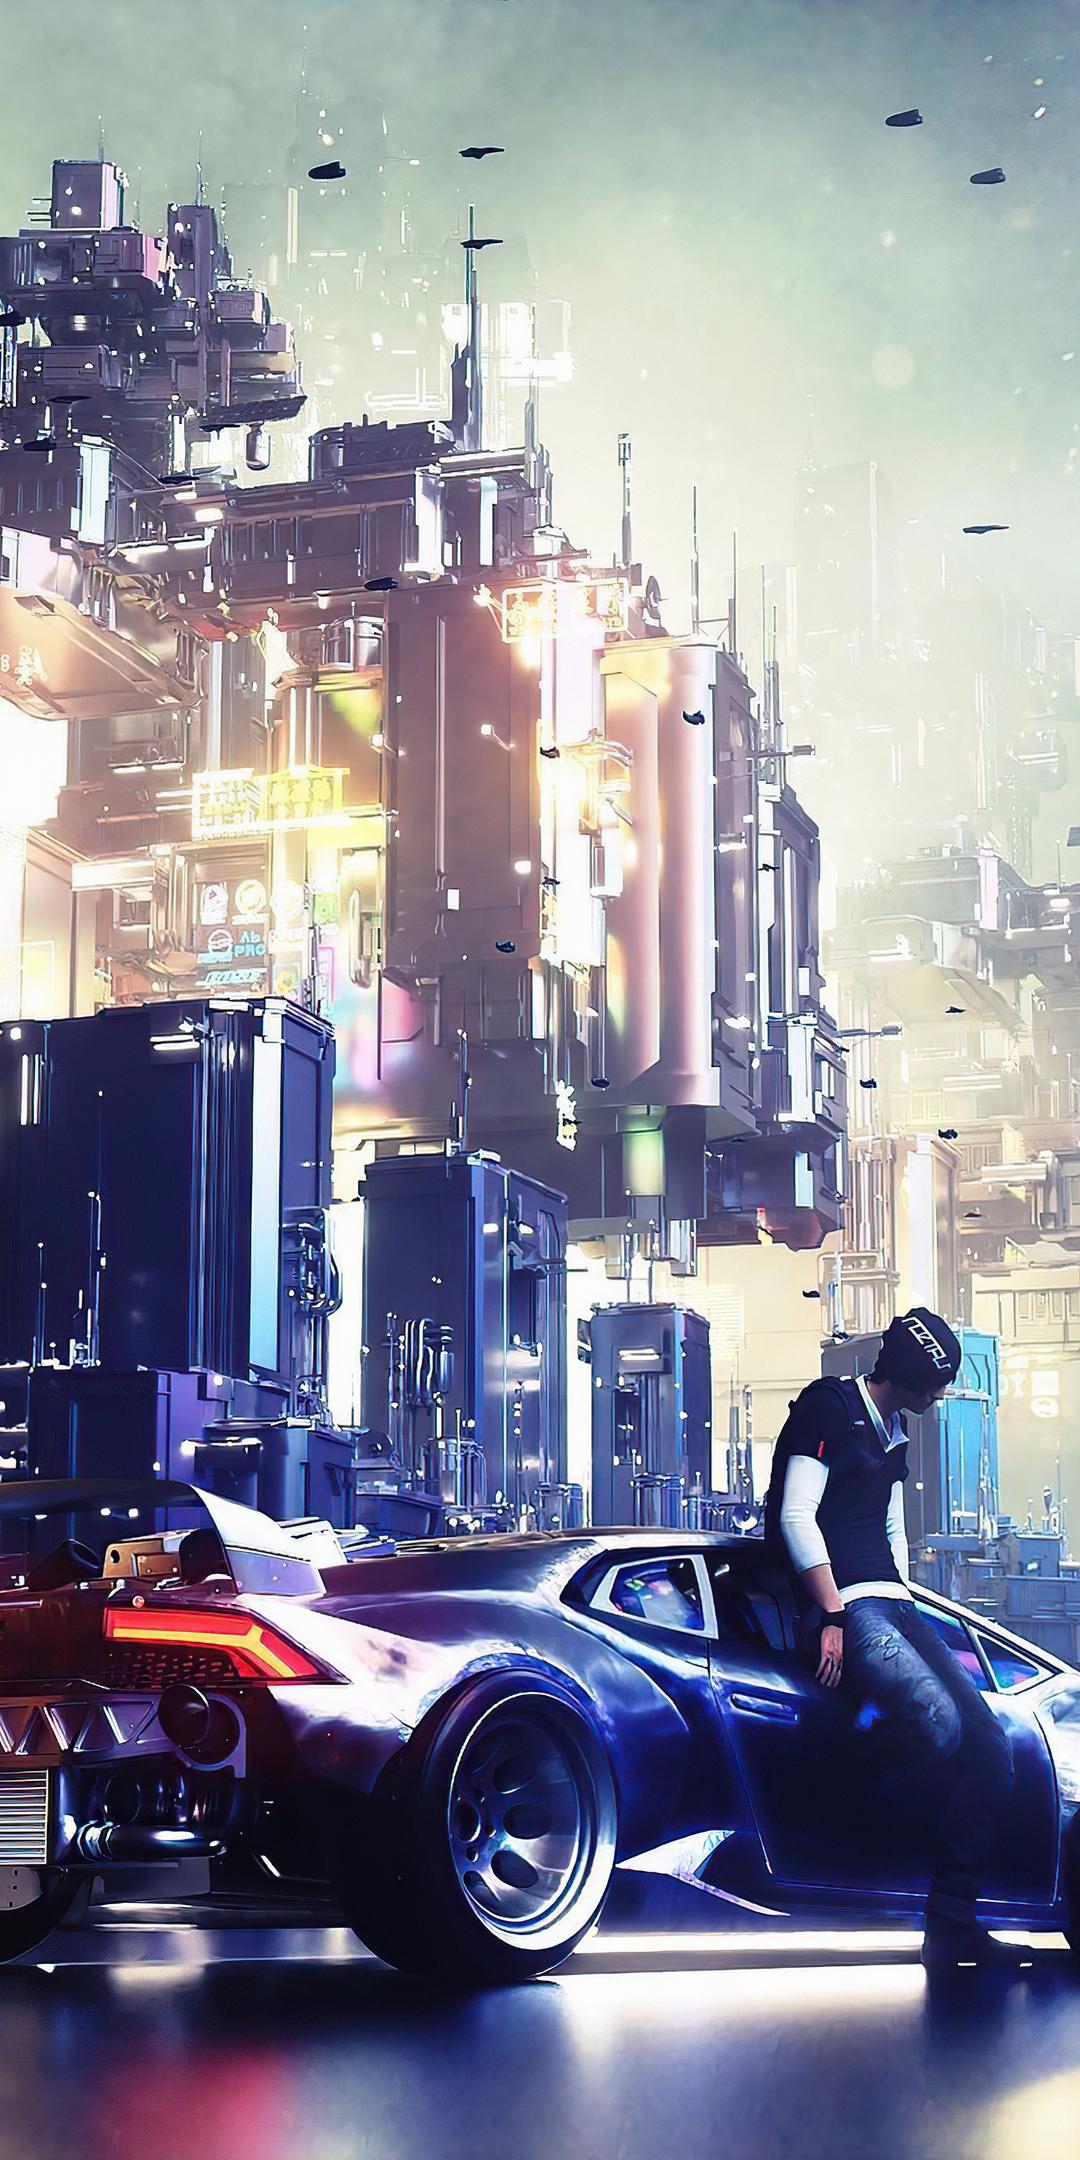 lambo-cyber-ride-4k-vv.jpg